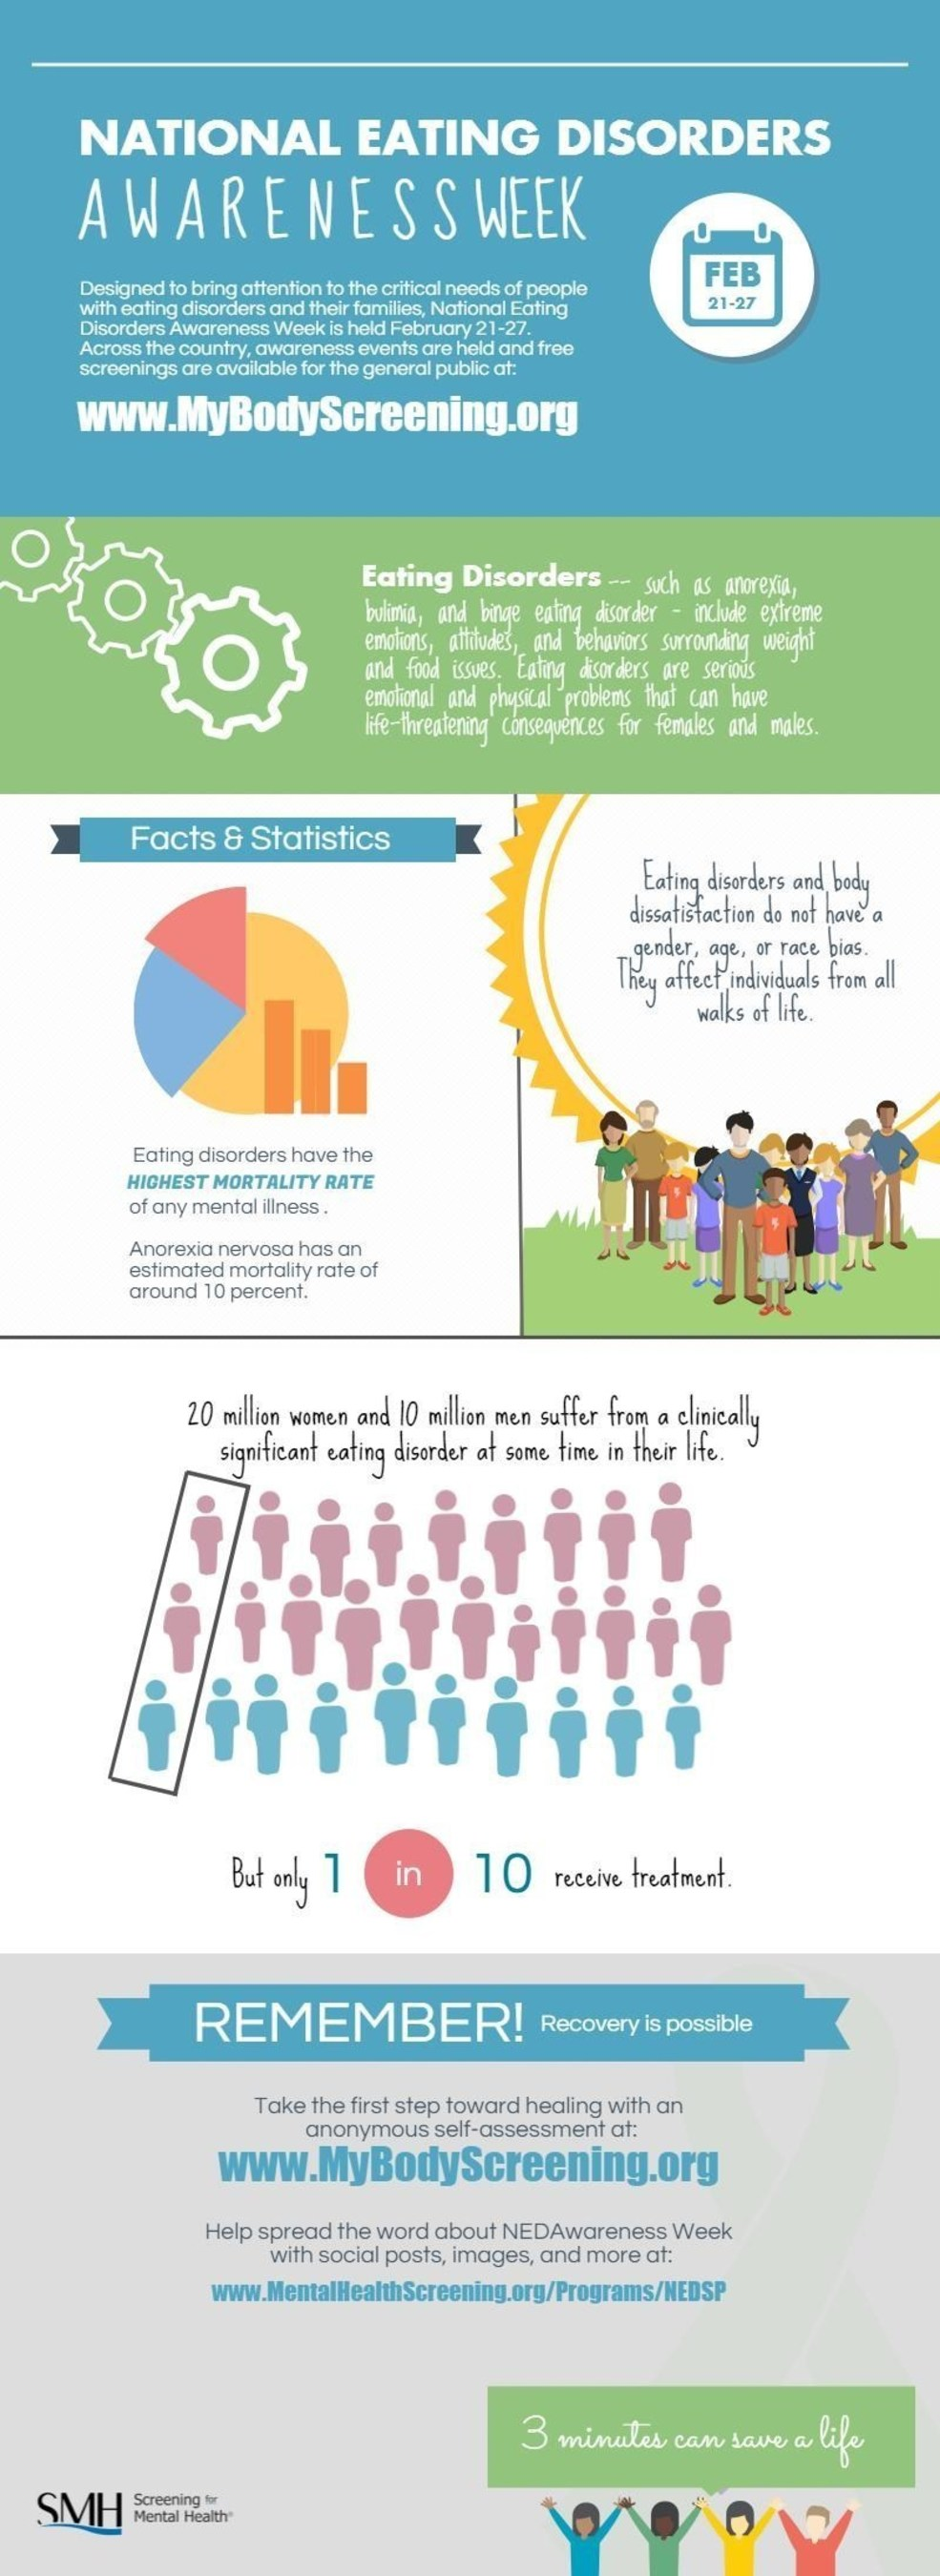 Eating Disorder Awareness Saves Lives.